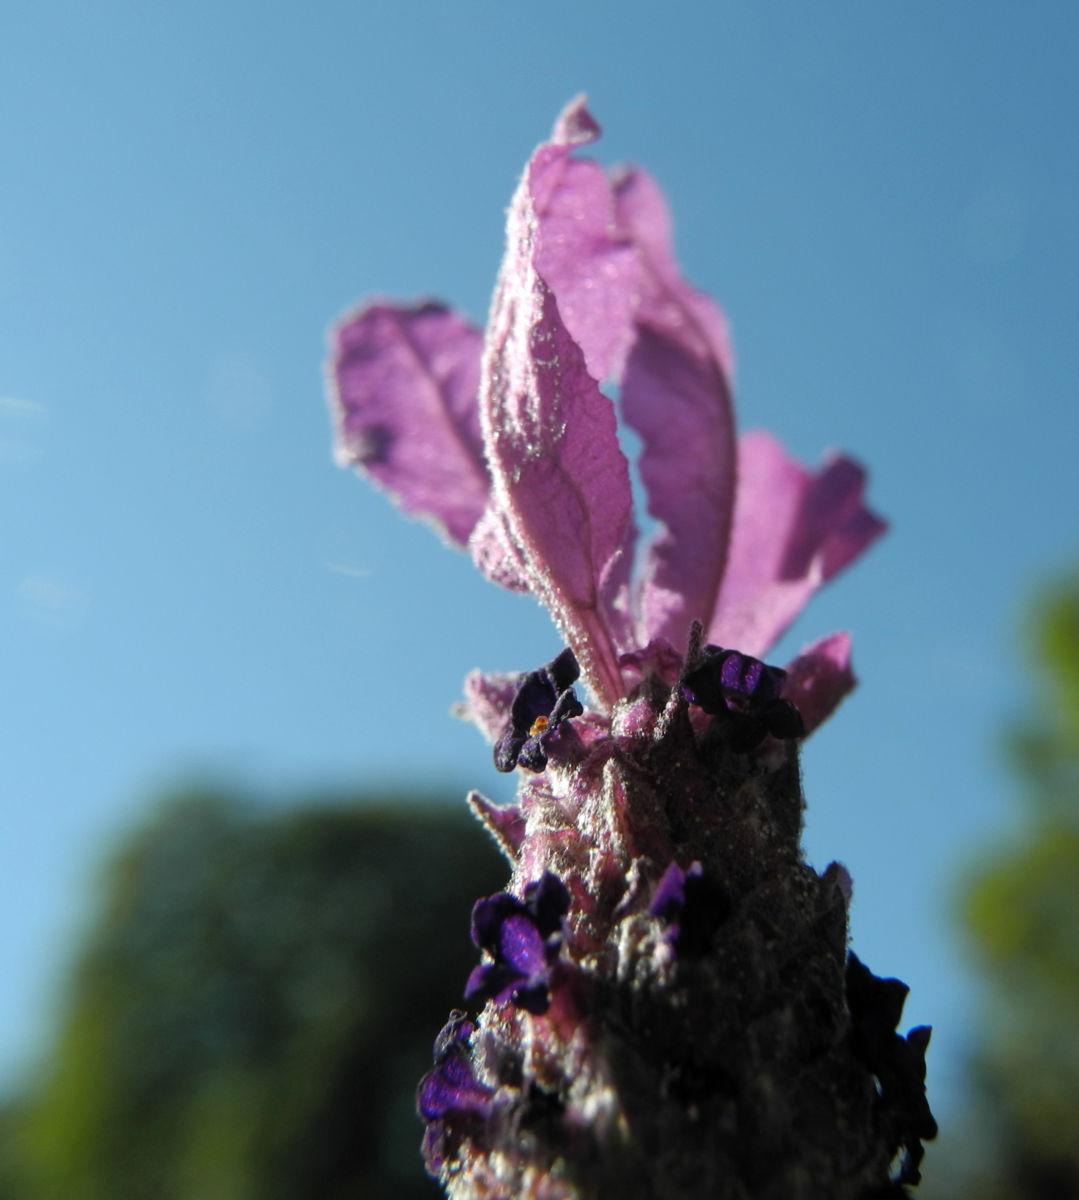 Schopf Lavendel Bluete lila Lavandula stoechas